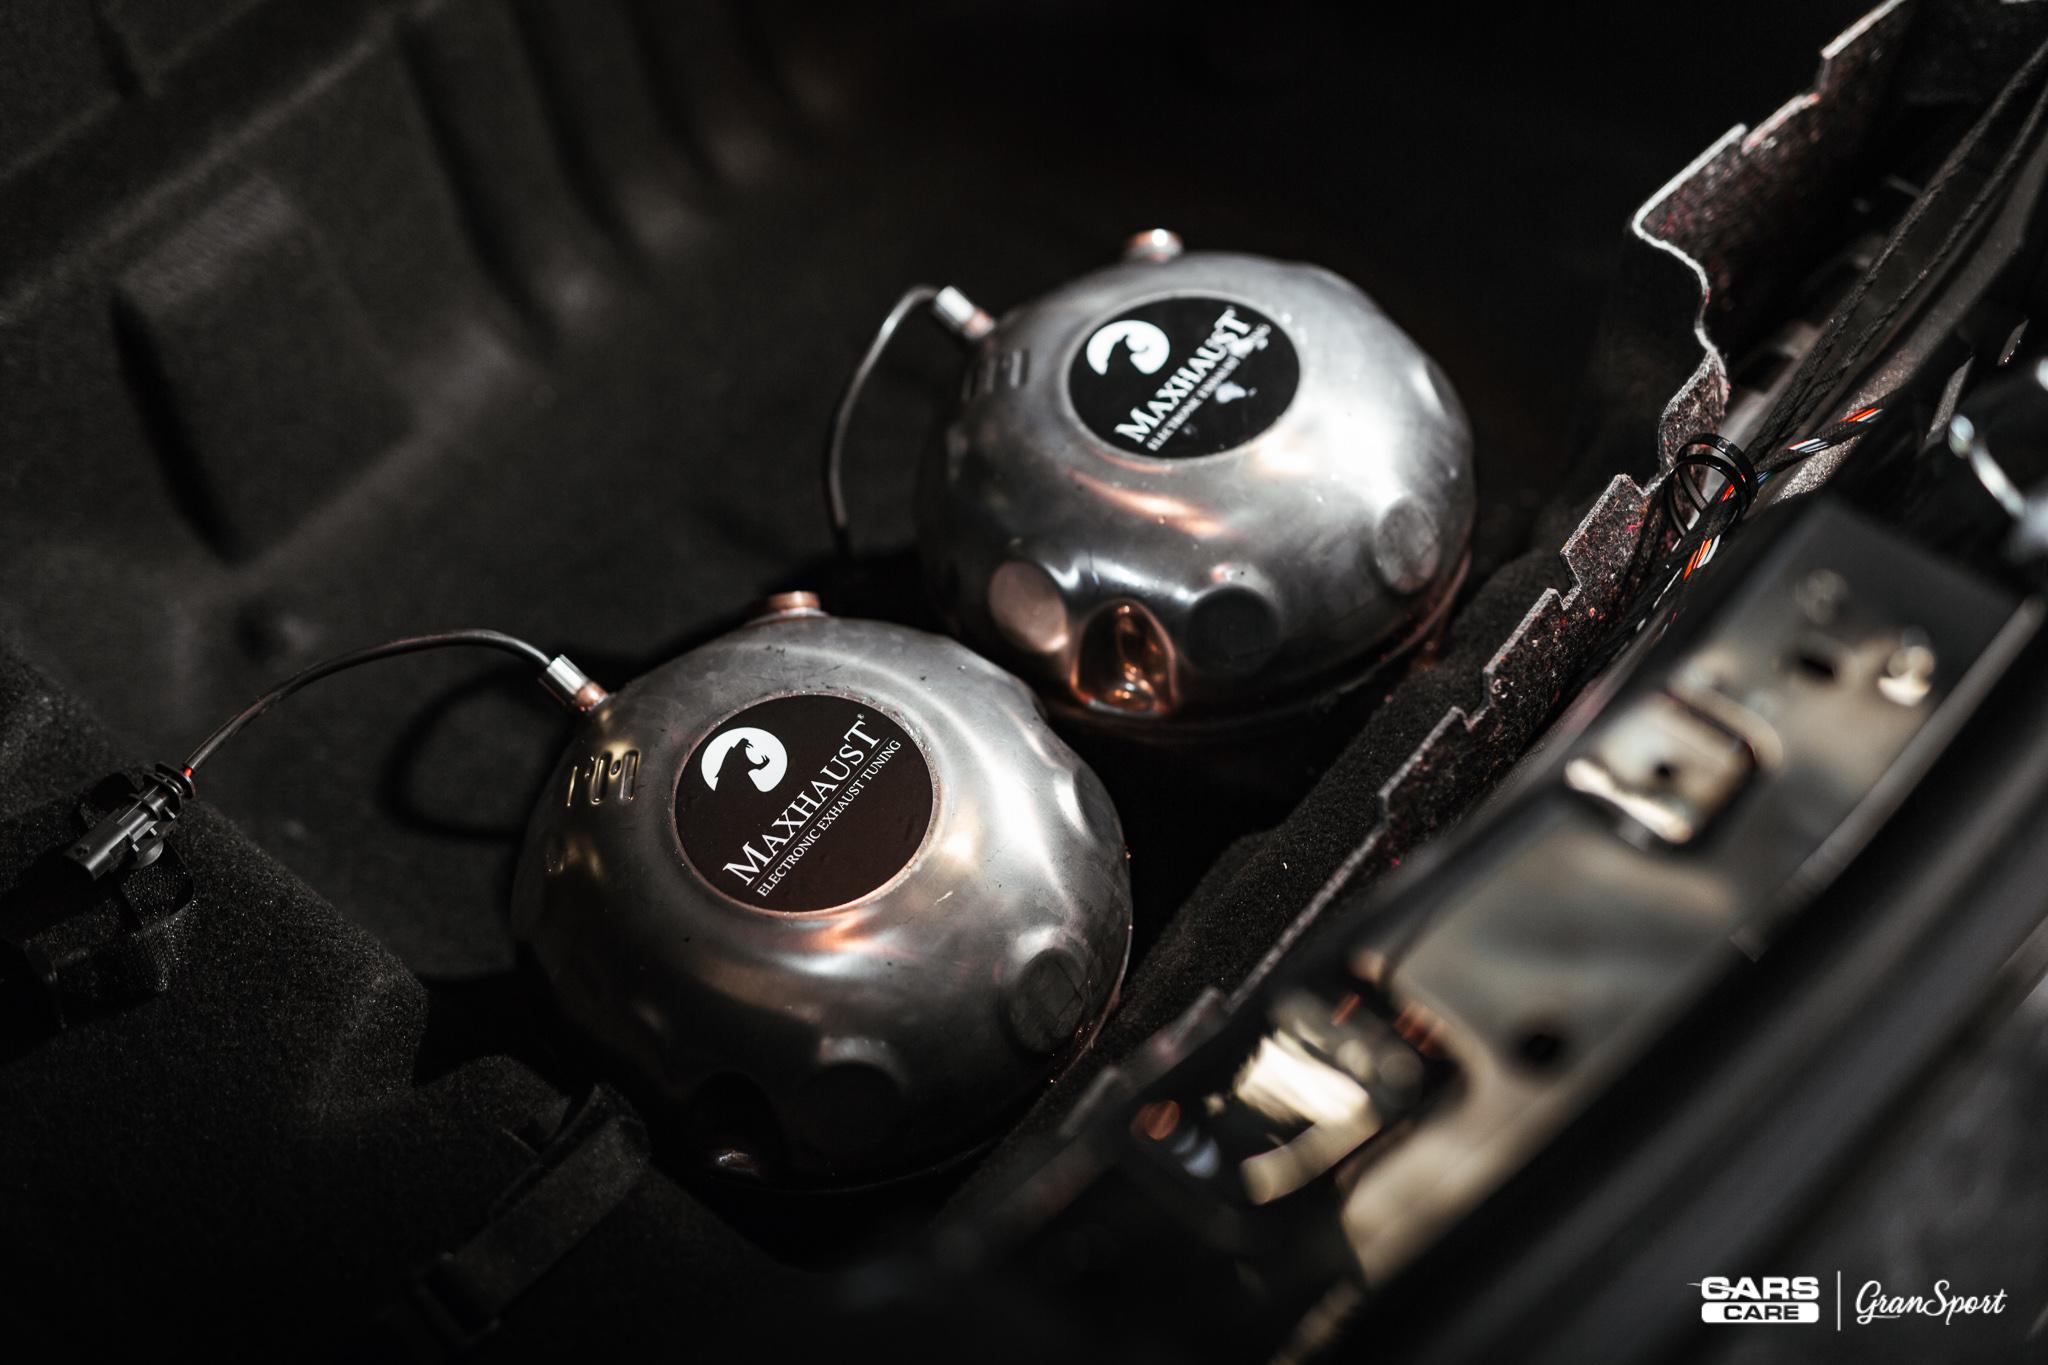 Mercedes E W213 Maxhaust